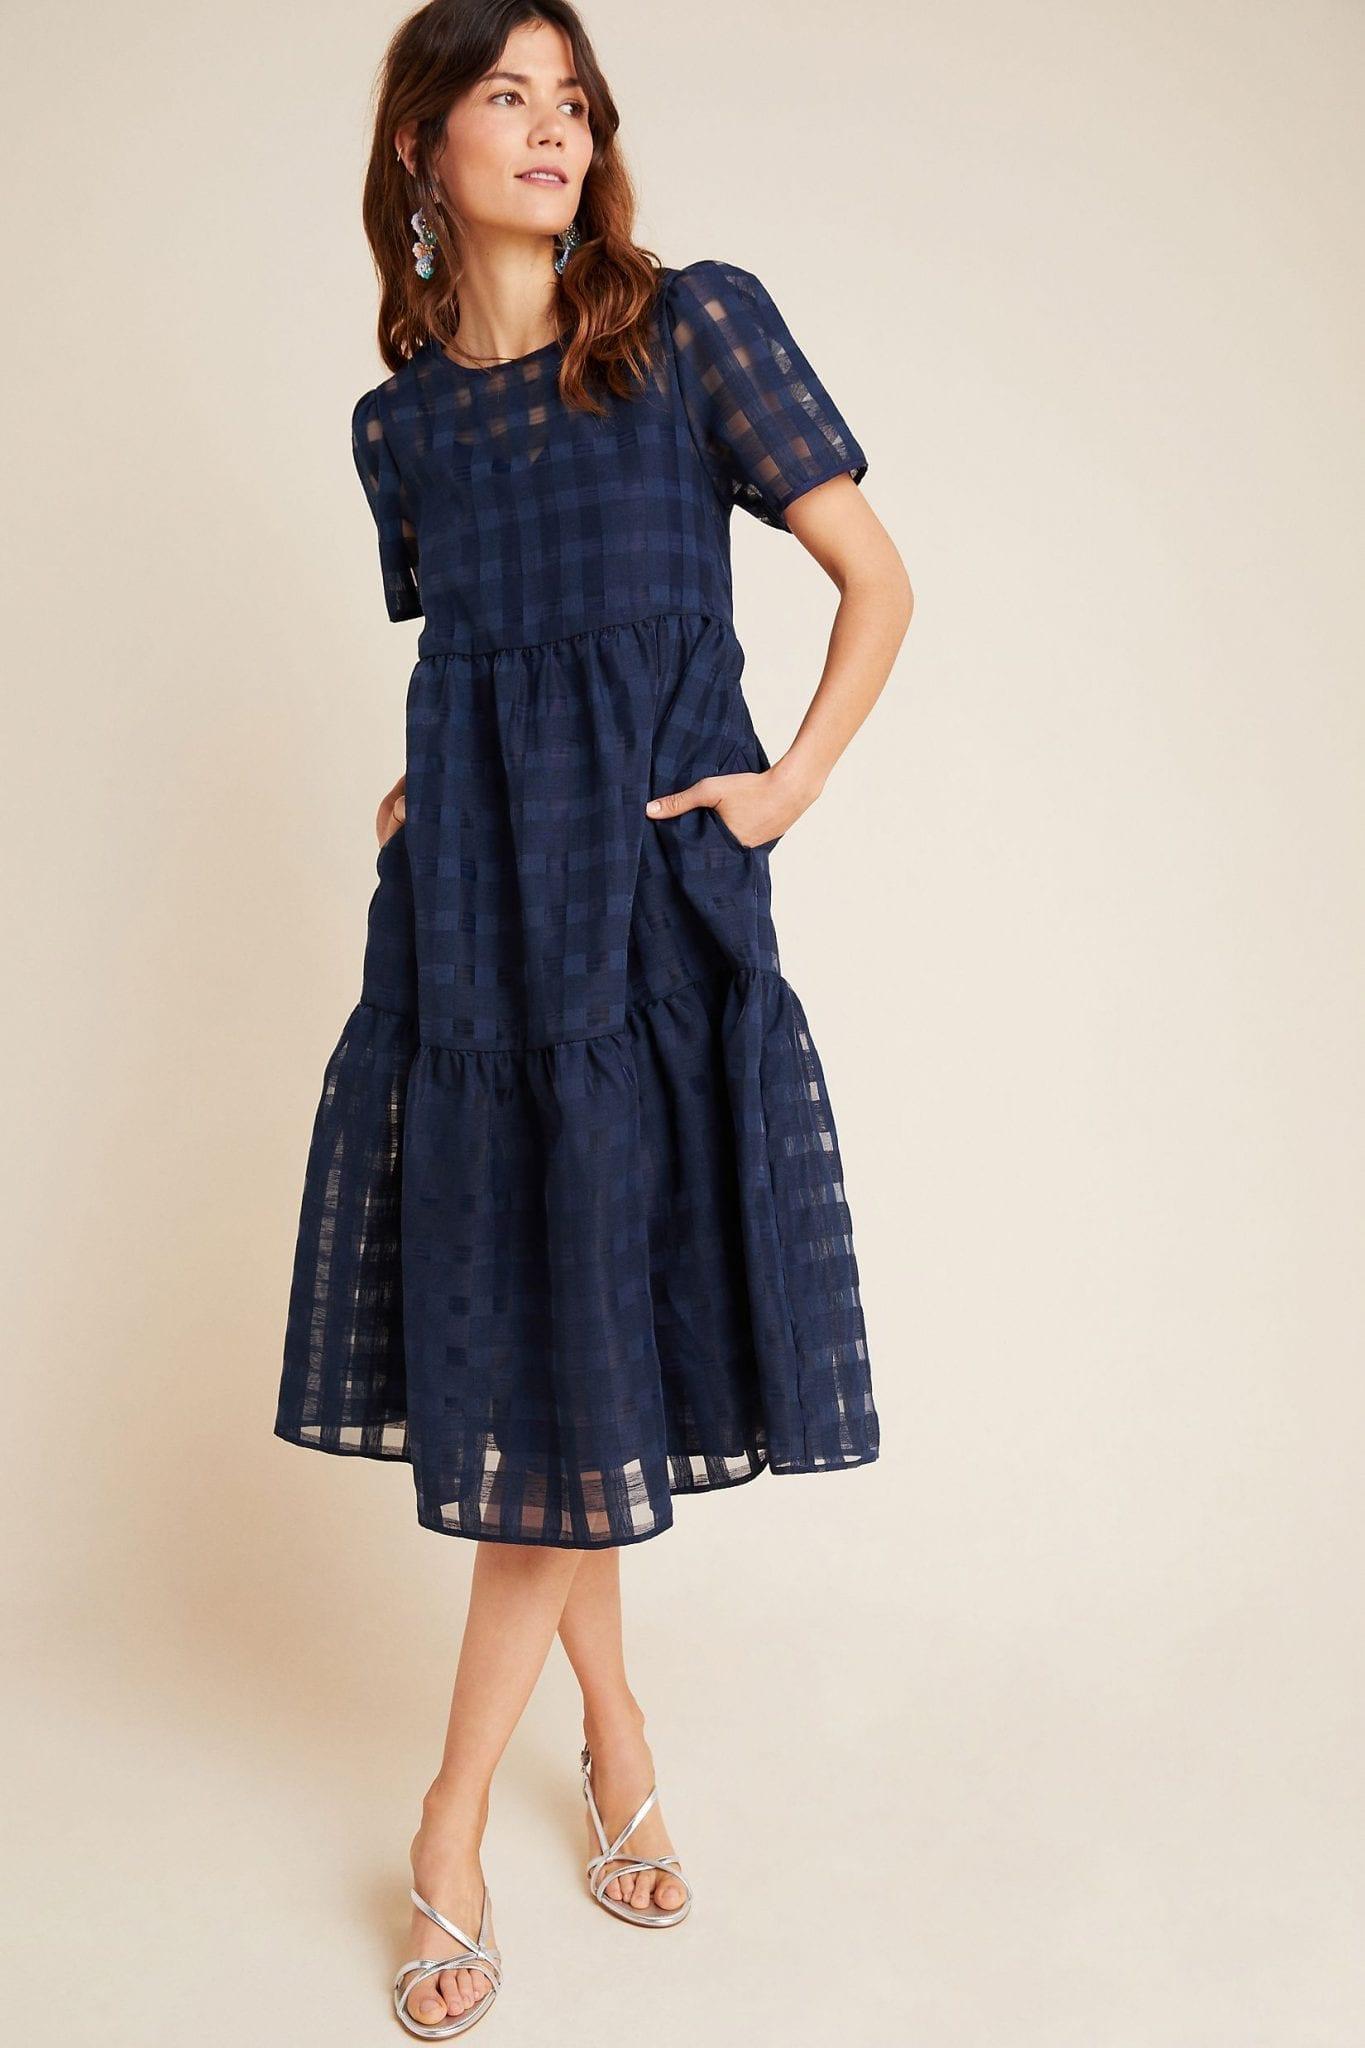 ERI + ALI Austen Tiered Midi Dress